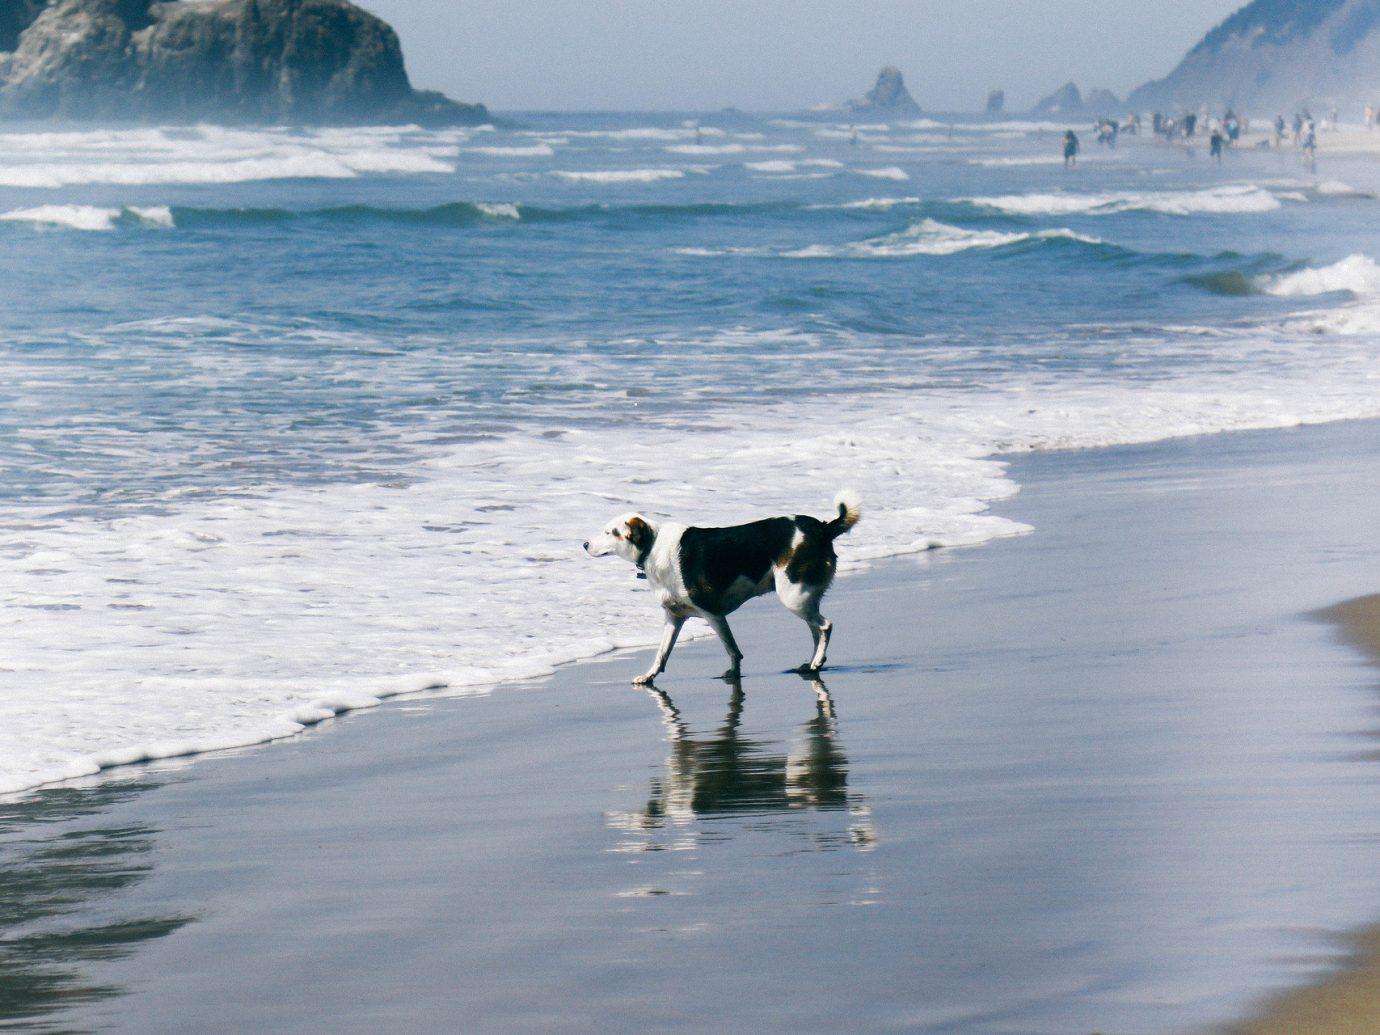 Road Trips Trip Ideas water outdoor Beach Sea Ocean Coast shore body of water Dog wave wind wave black arctic ice dog like mammal